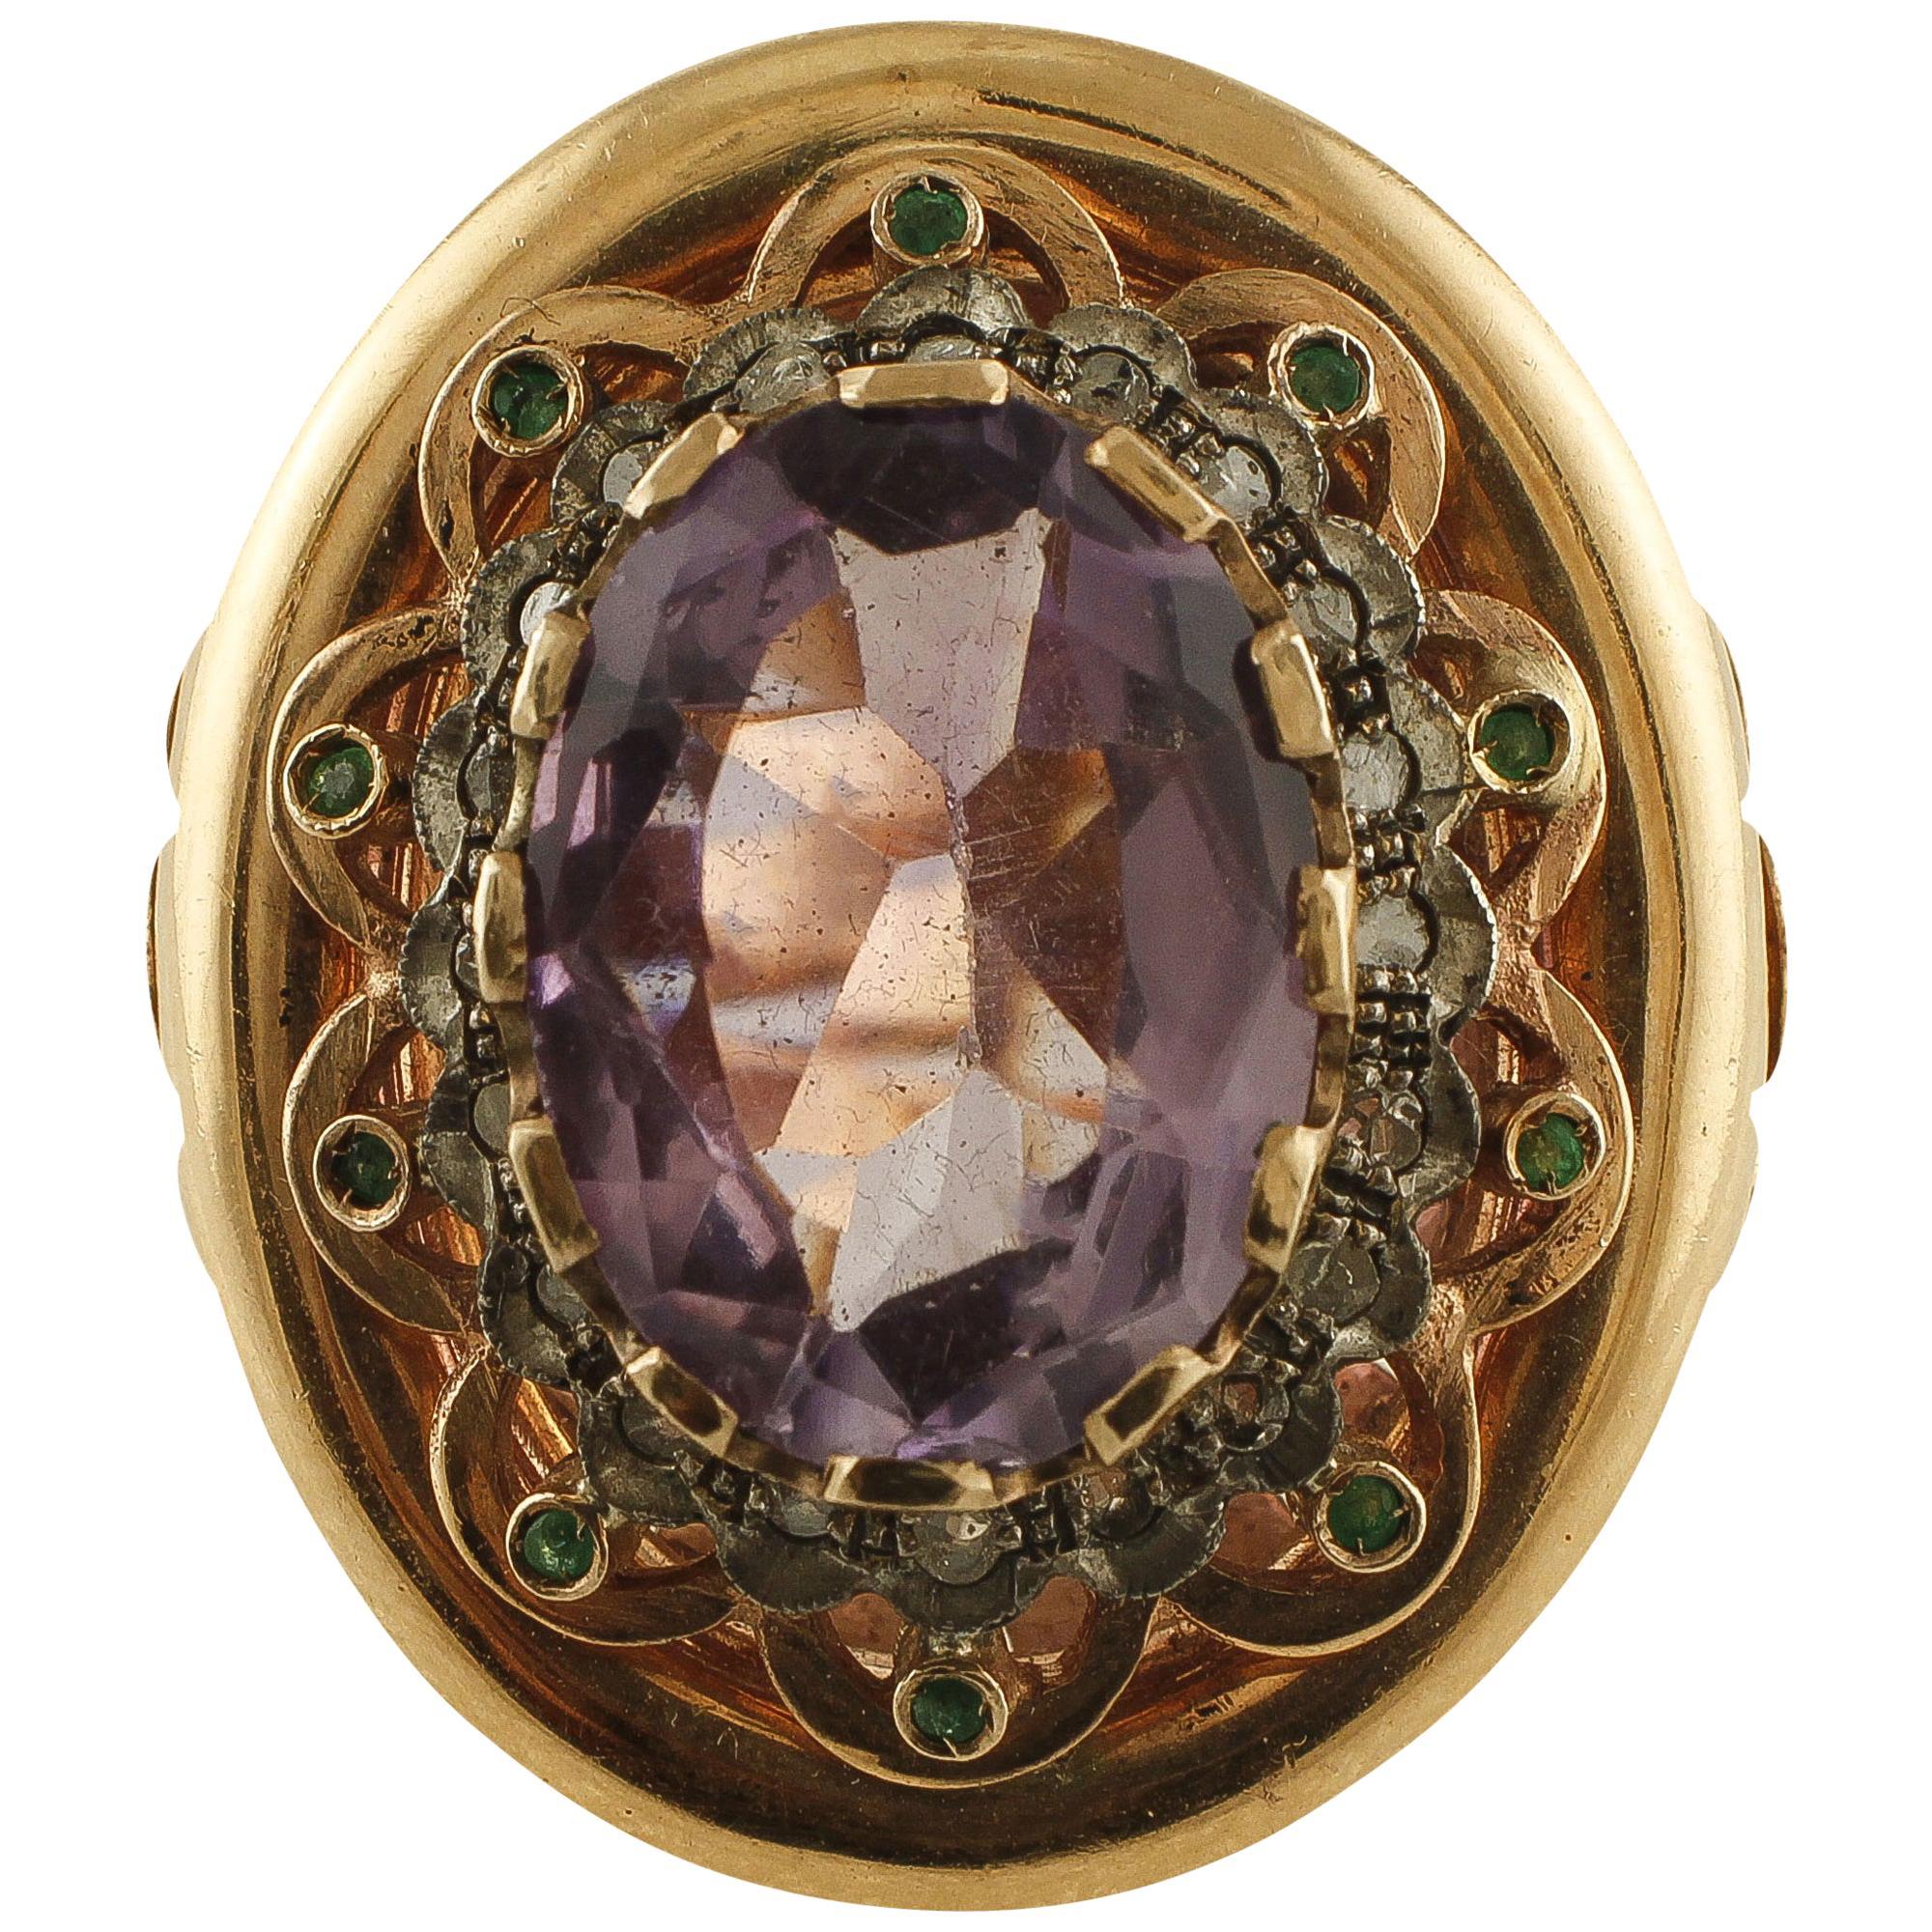 Amethyst, Emeralds, Diamonds, 9 Karat Rose Gold and Silver Retro Ring